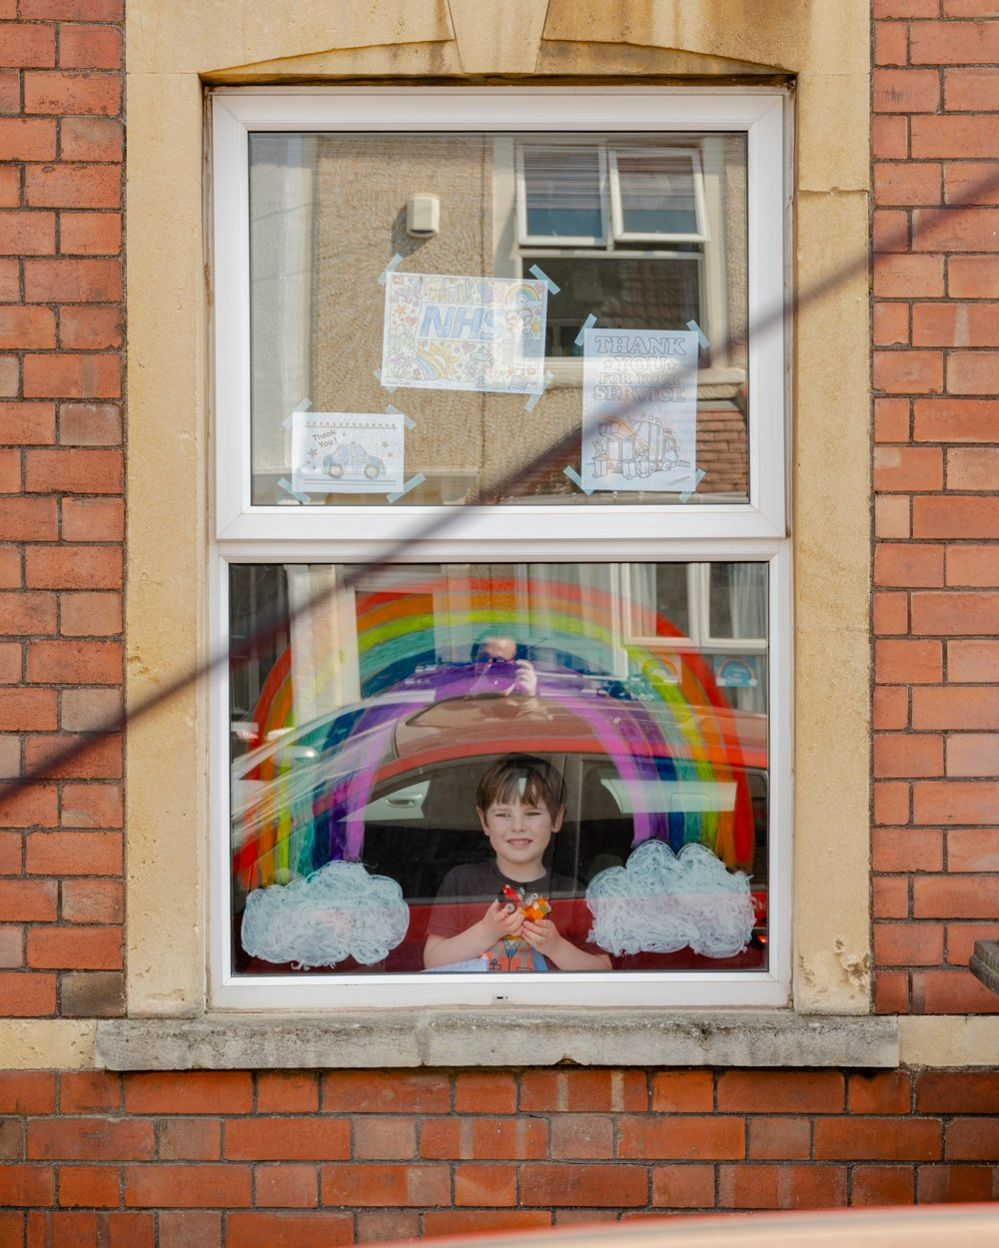 Huey at the window